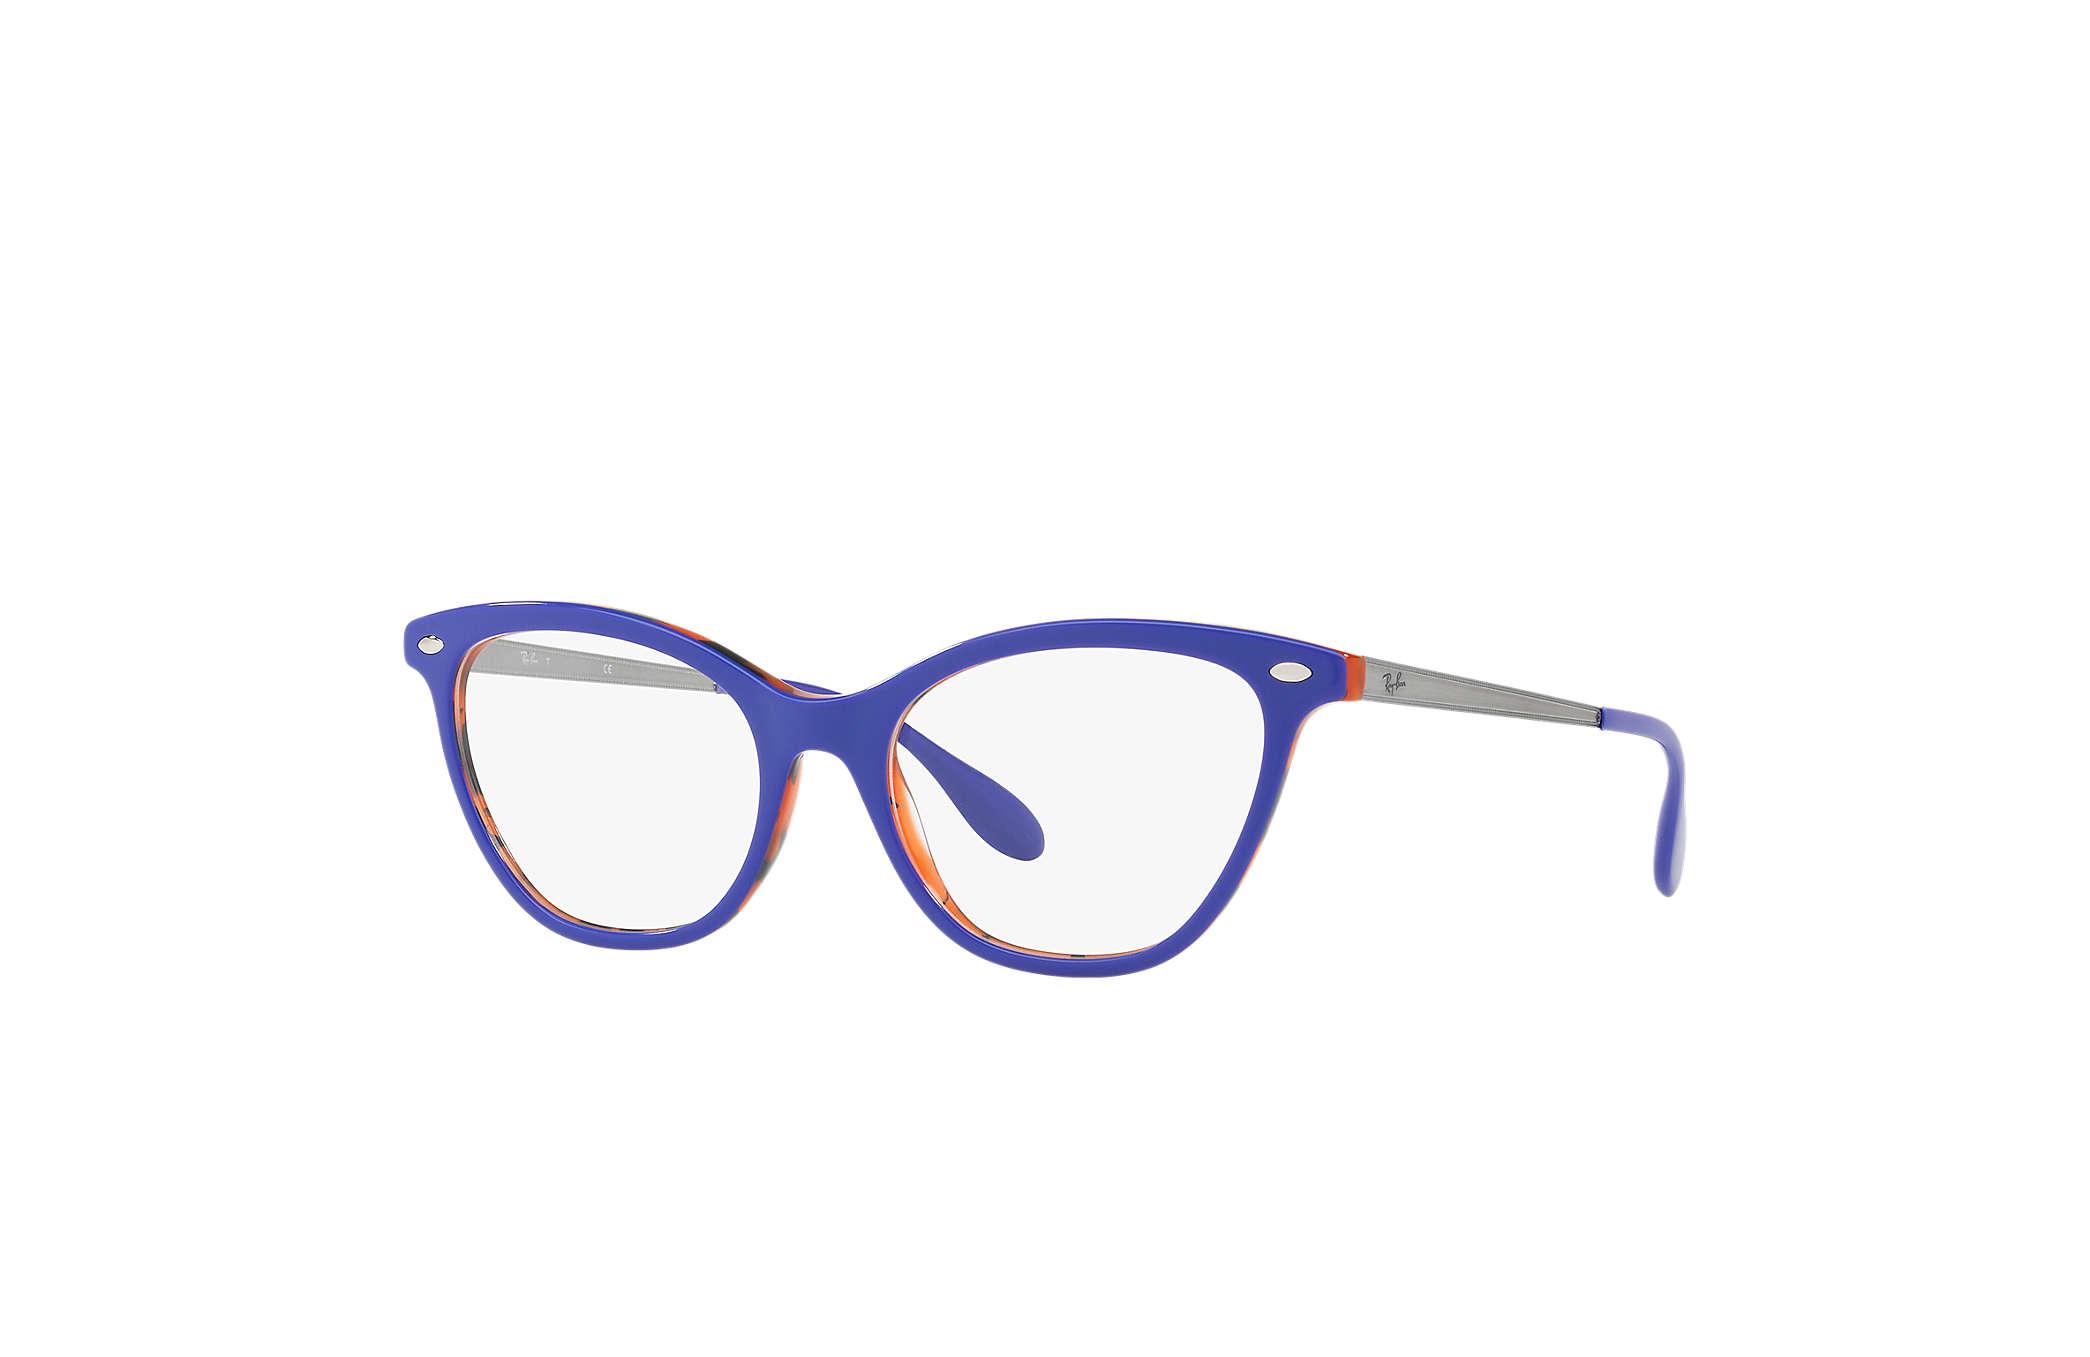 9fe1a285b5e Ray-Ban eyeglasses RB5360 Blue - Acetate - 0RX5360571652